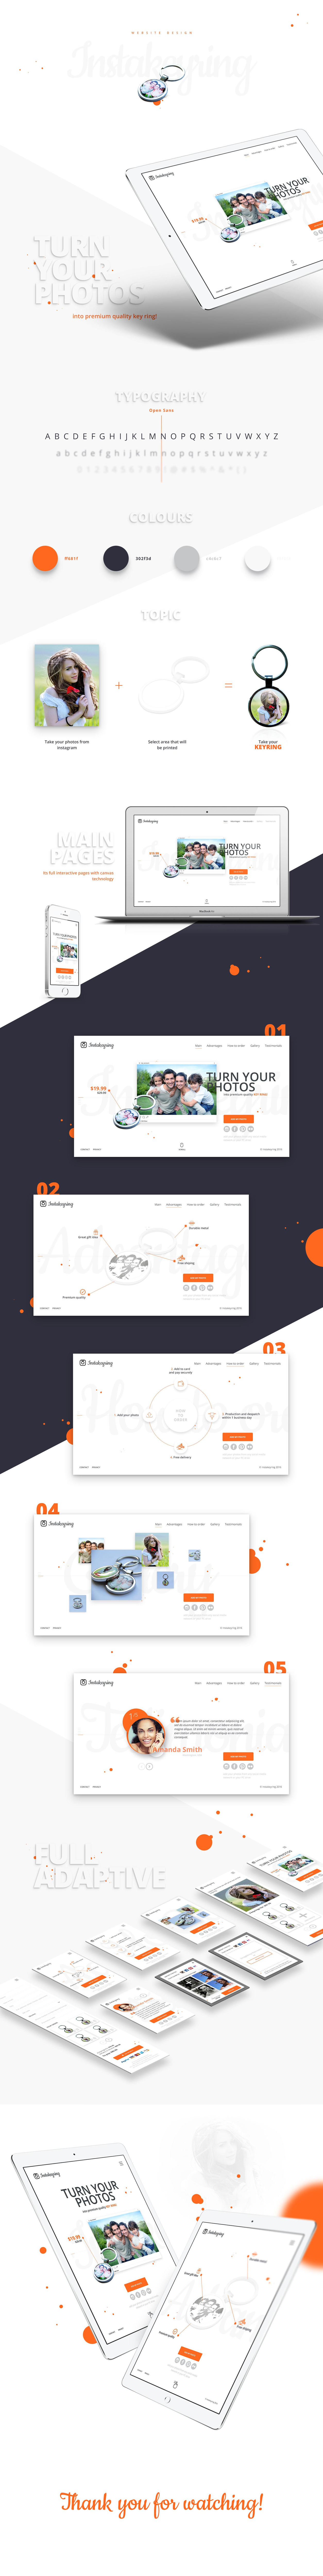 5e686526 Фрилансер Никита Александрович • дизайн сайтов и дизайн интерфейсов ...